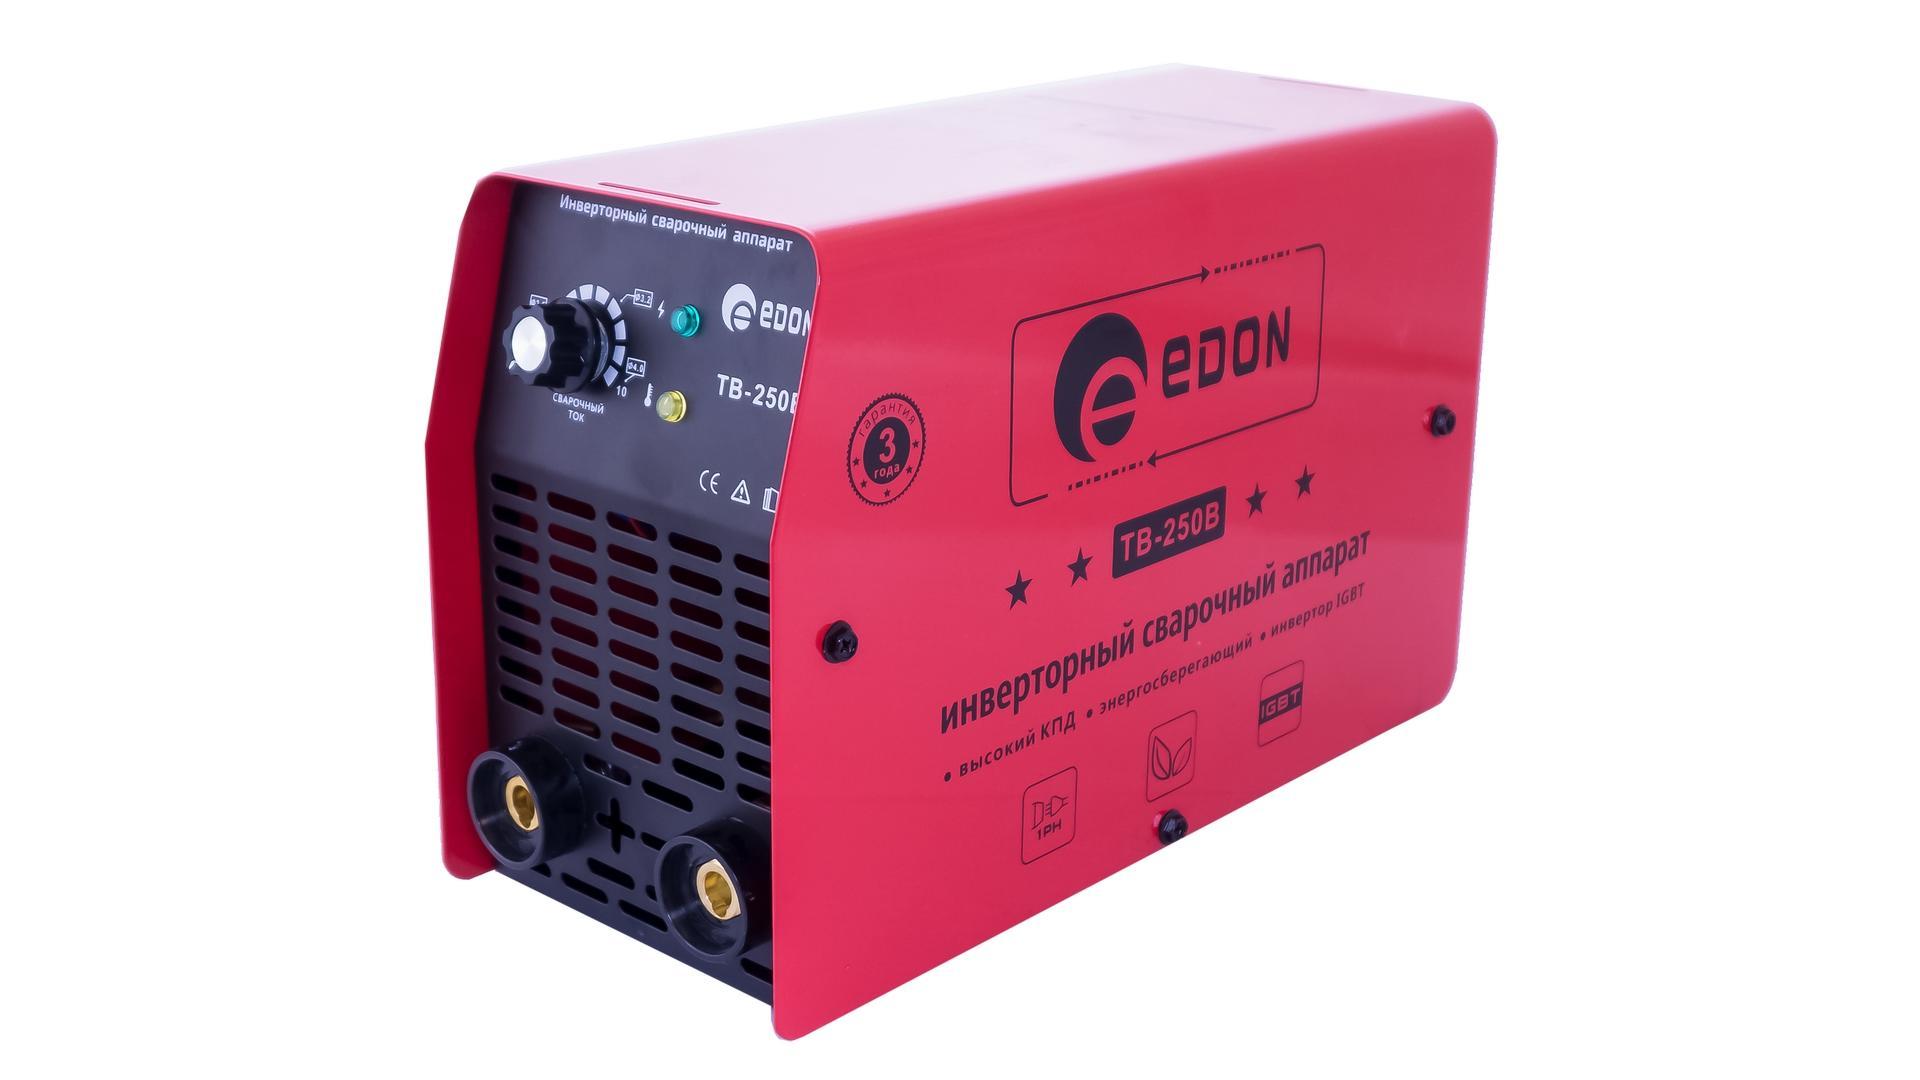 Сварочный инвертор Edon - TB-250B 5